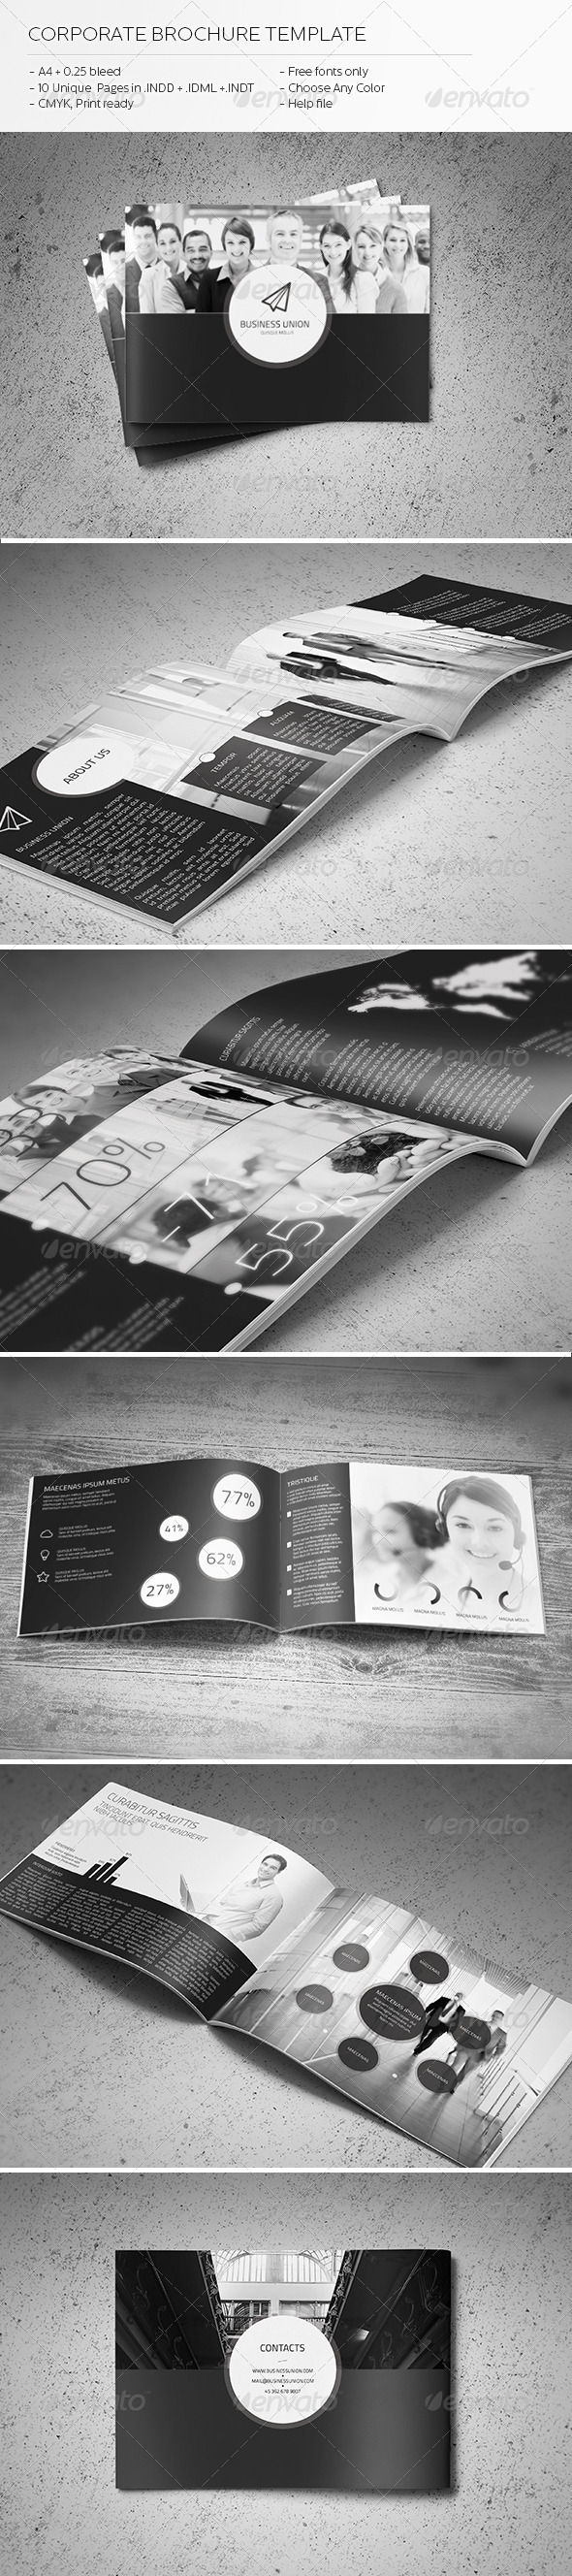 GraphicRiver Corporate Brochure Template 2 5740939